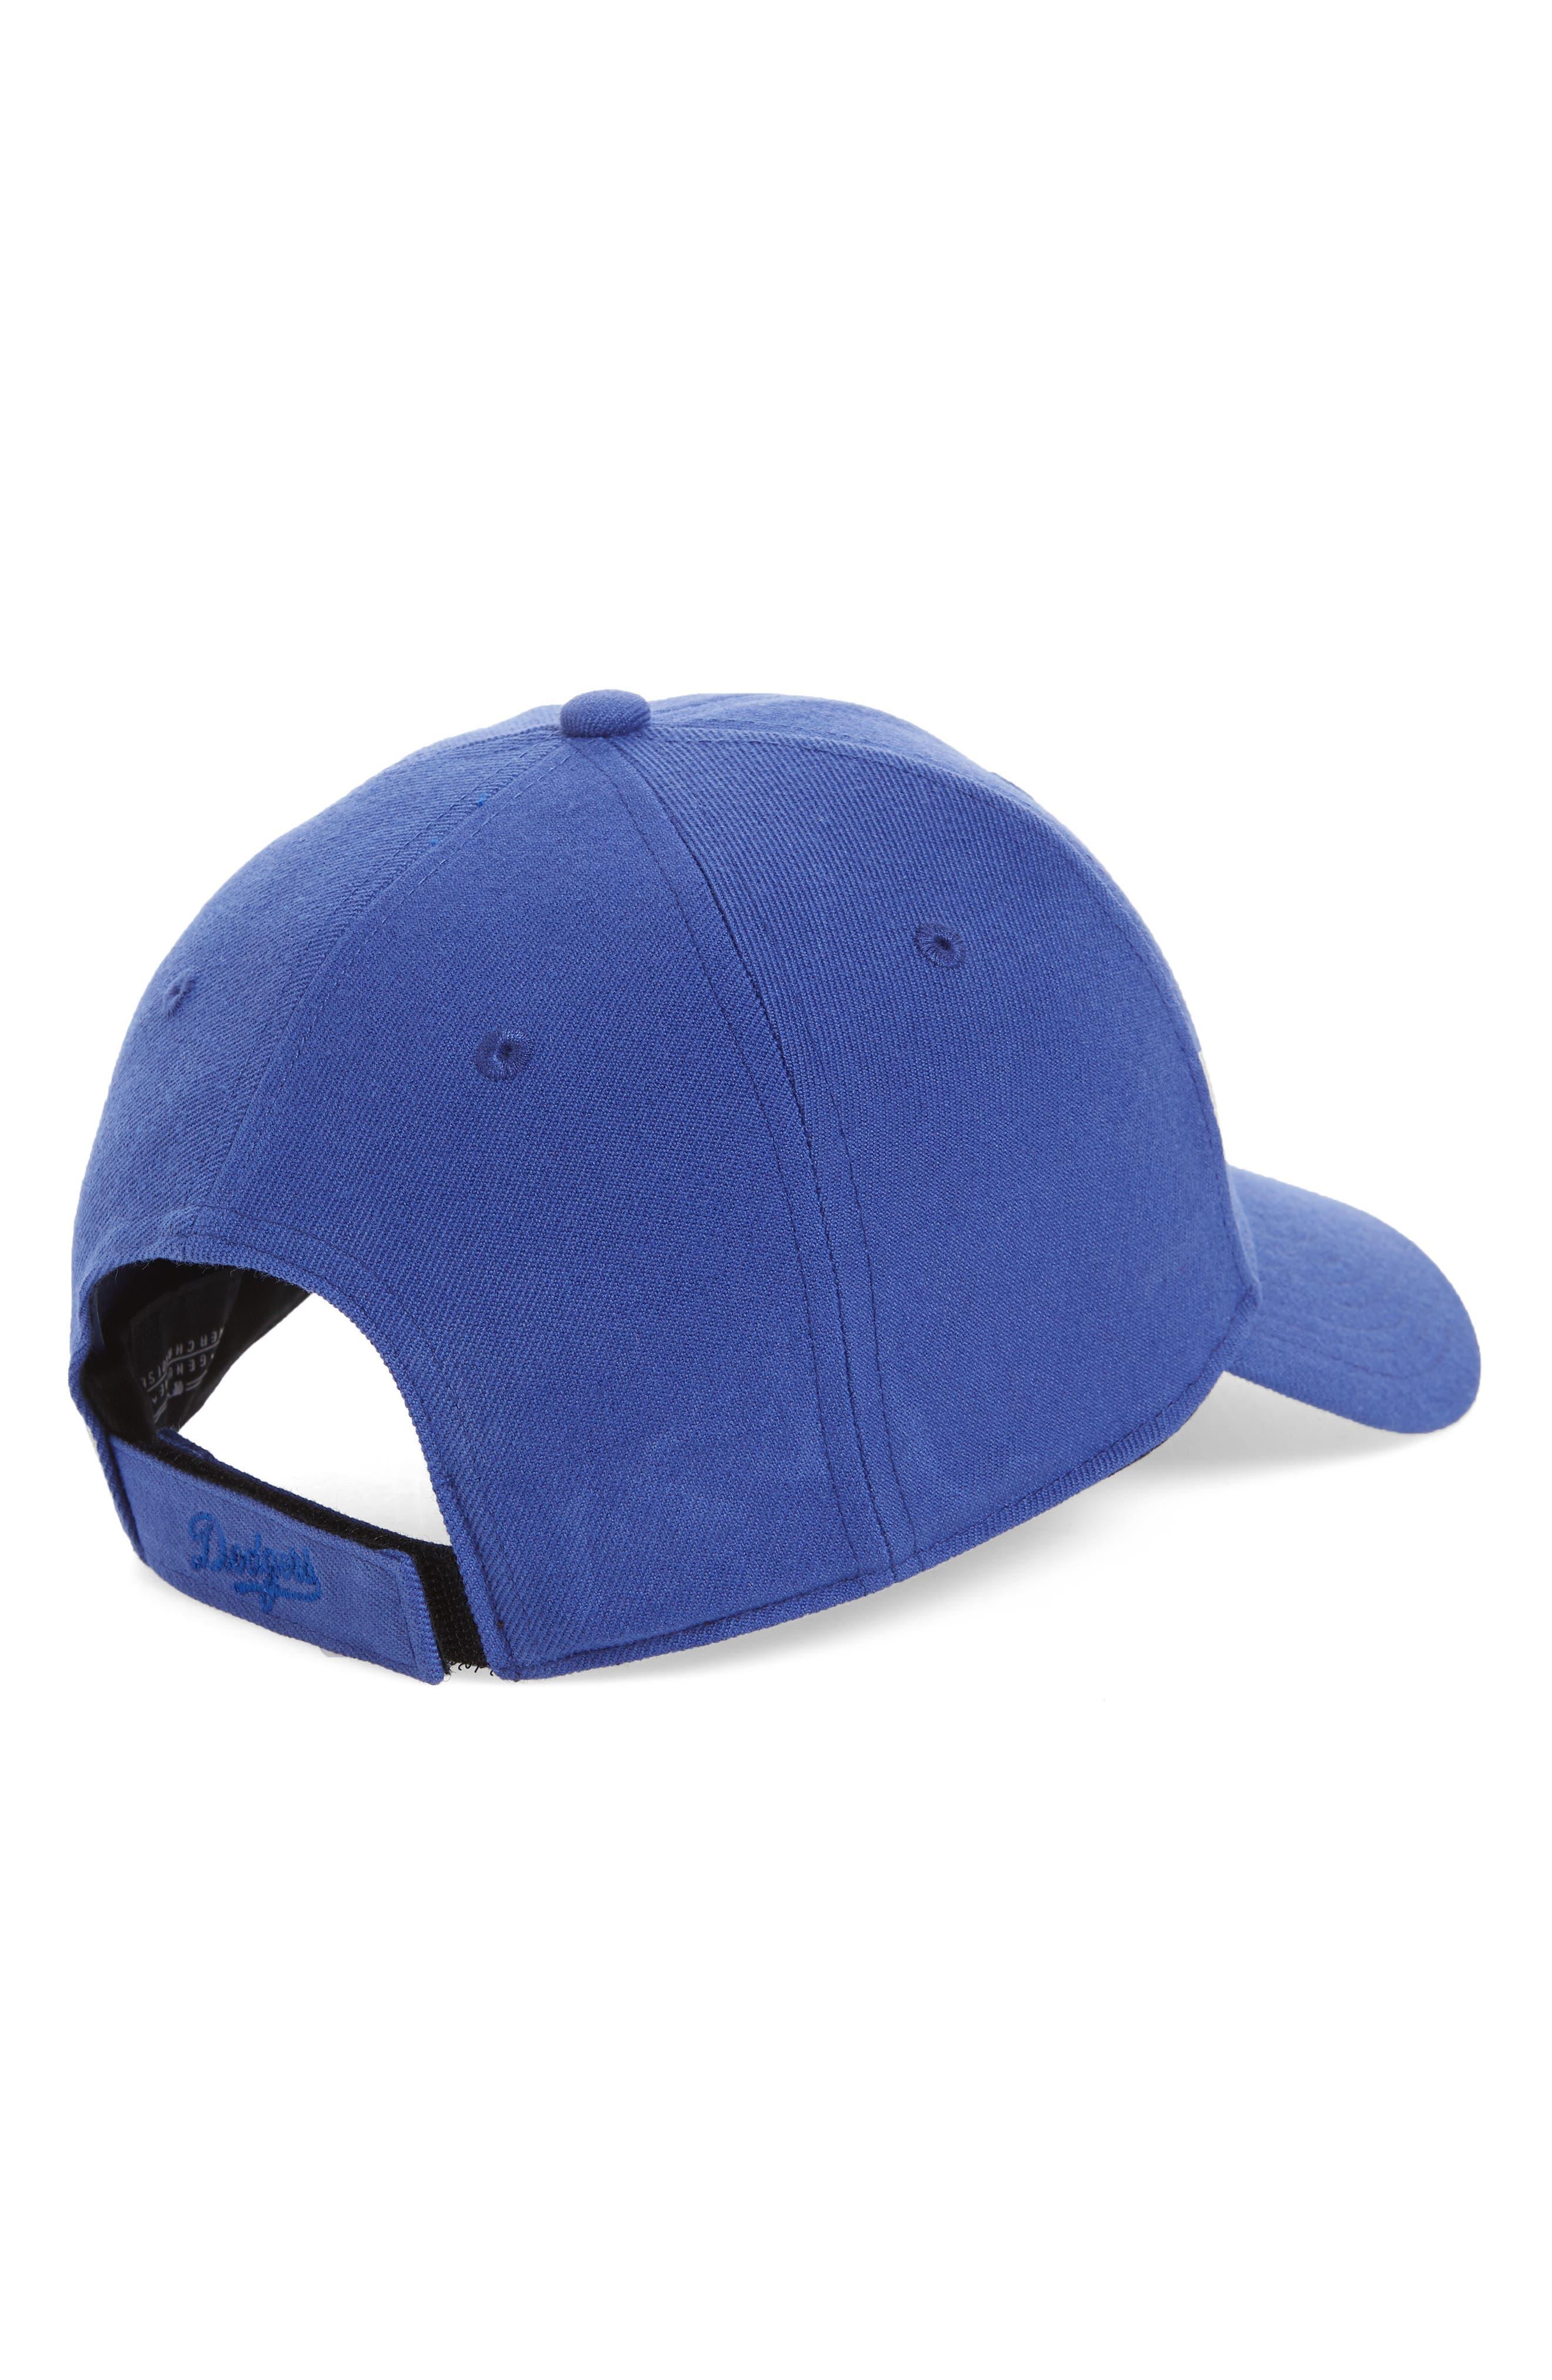 MVP LA Dodgers Baseball Cap,                             Alternate thumbnail 2, color,                             400